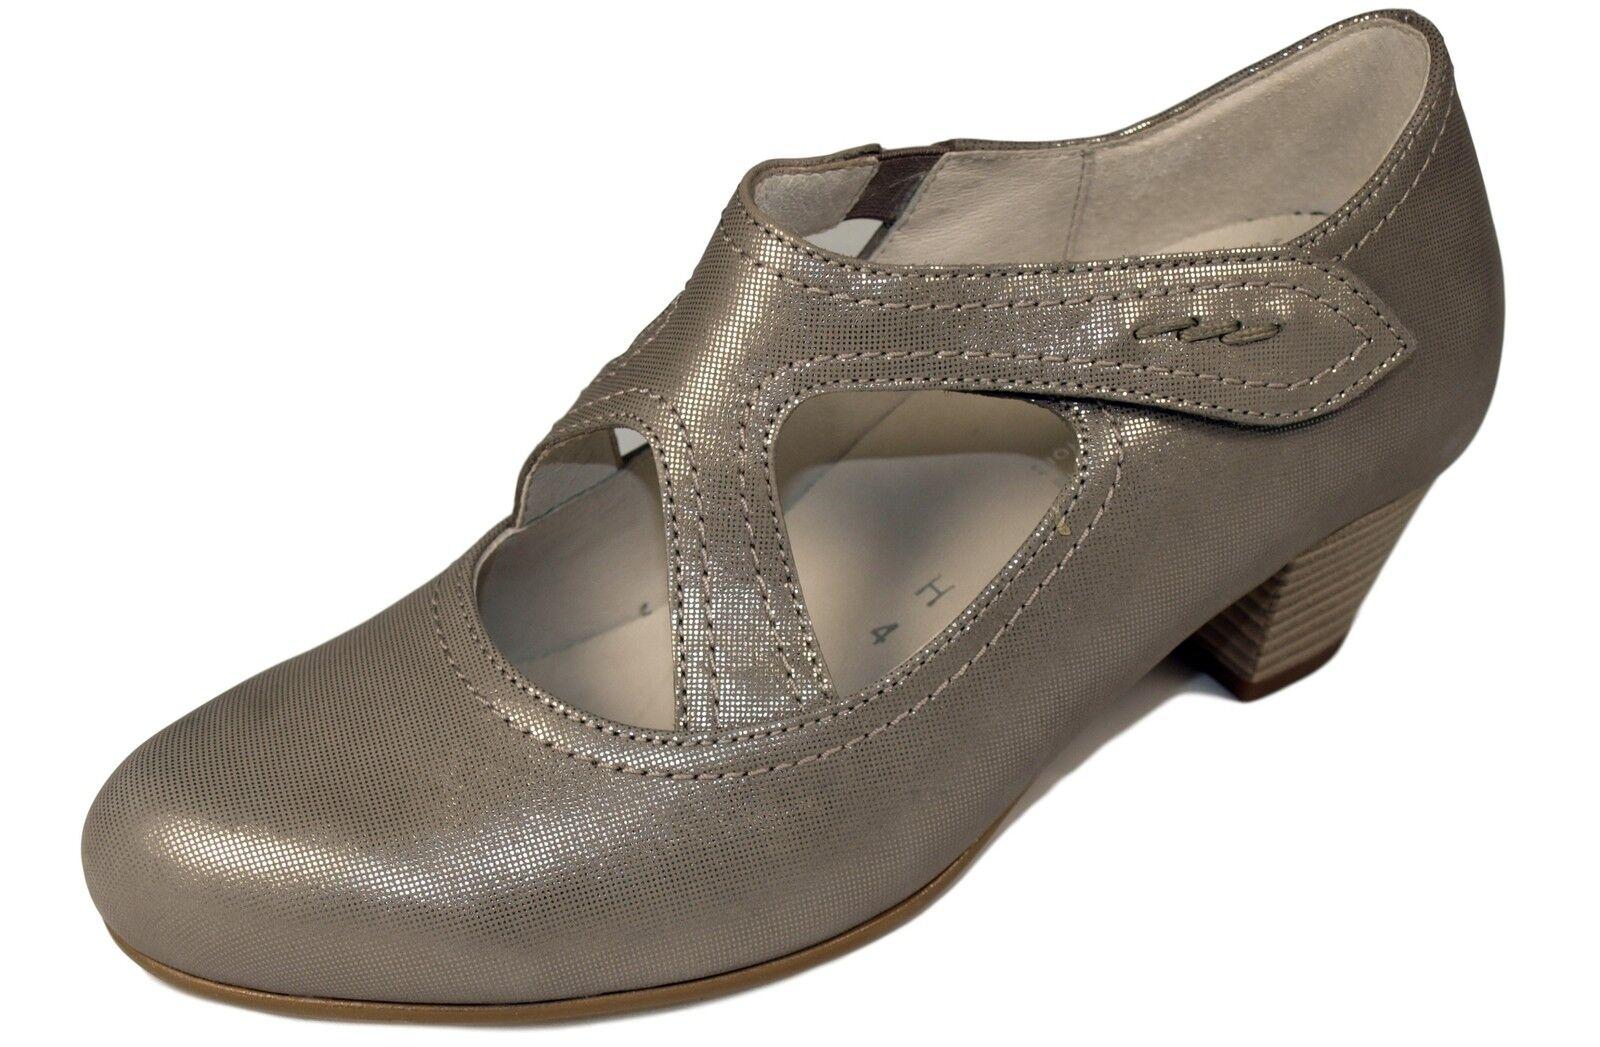 Gabor Stiefelette taupe Gr. 8 = Gr. 42 NEU (512) | eBay